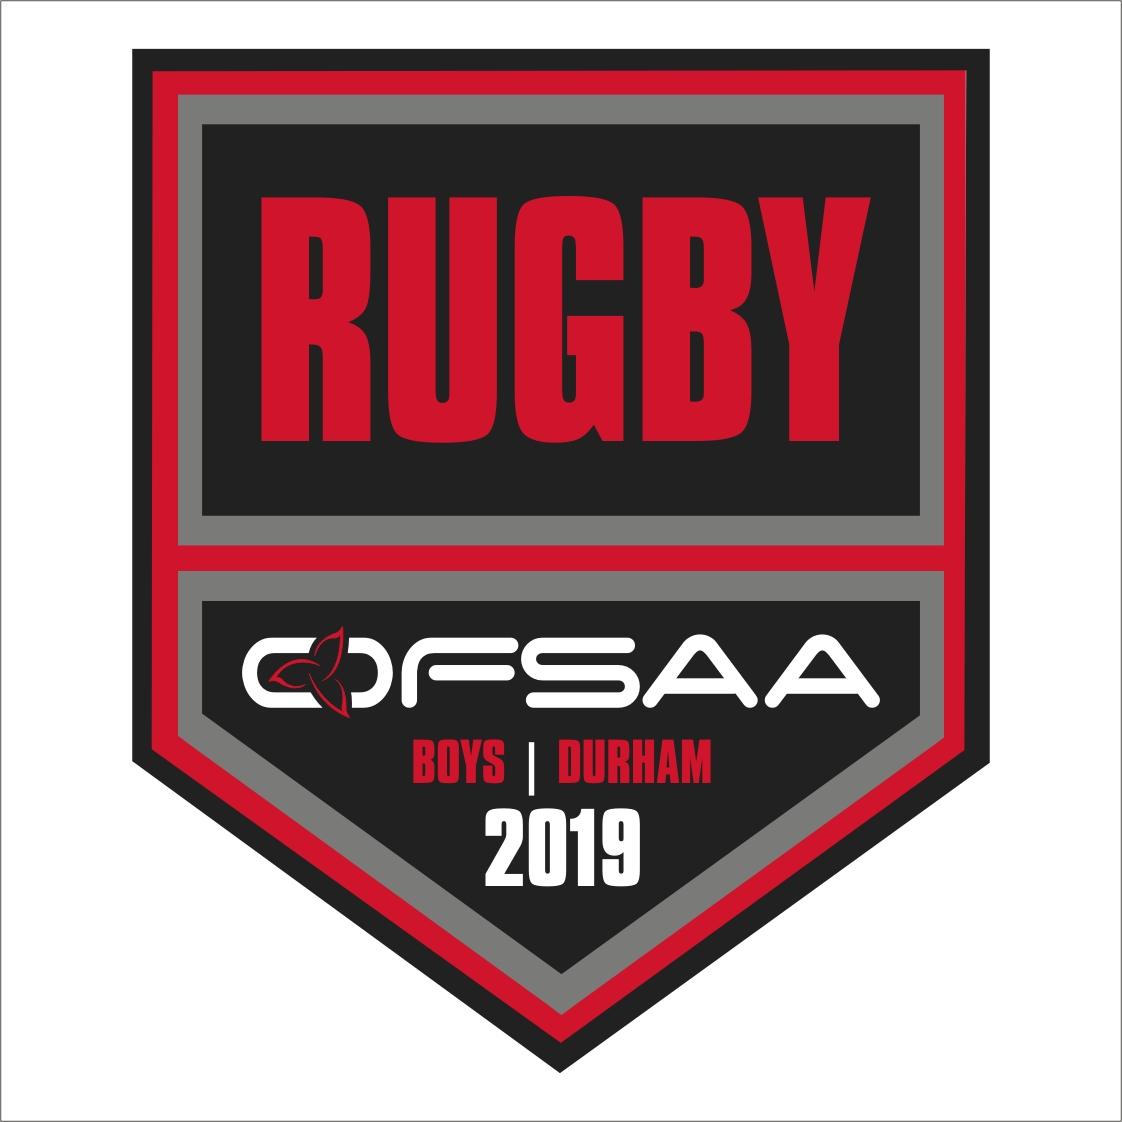 2019 Boys Rugby logo white.jpg